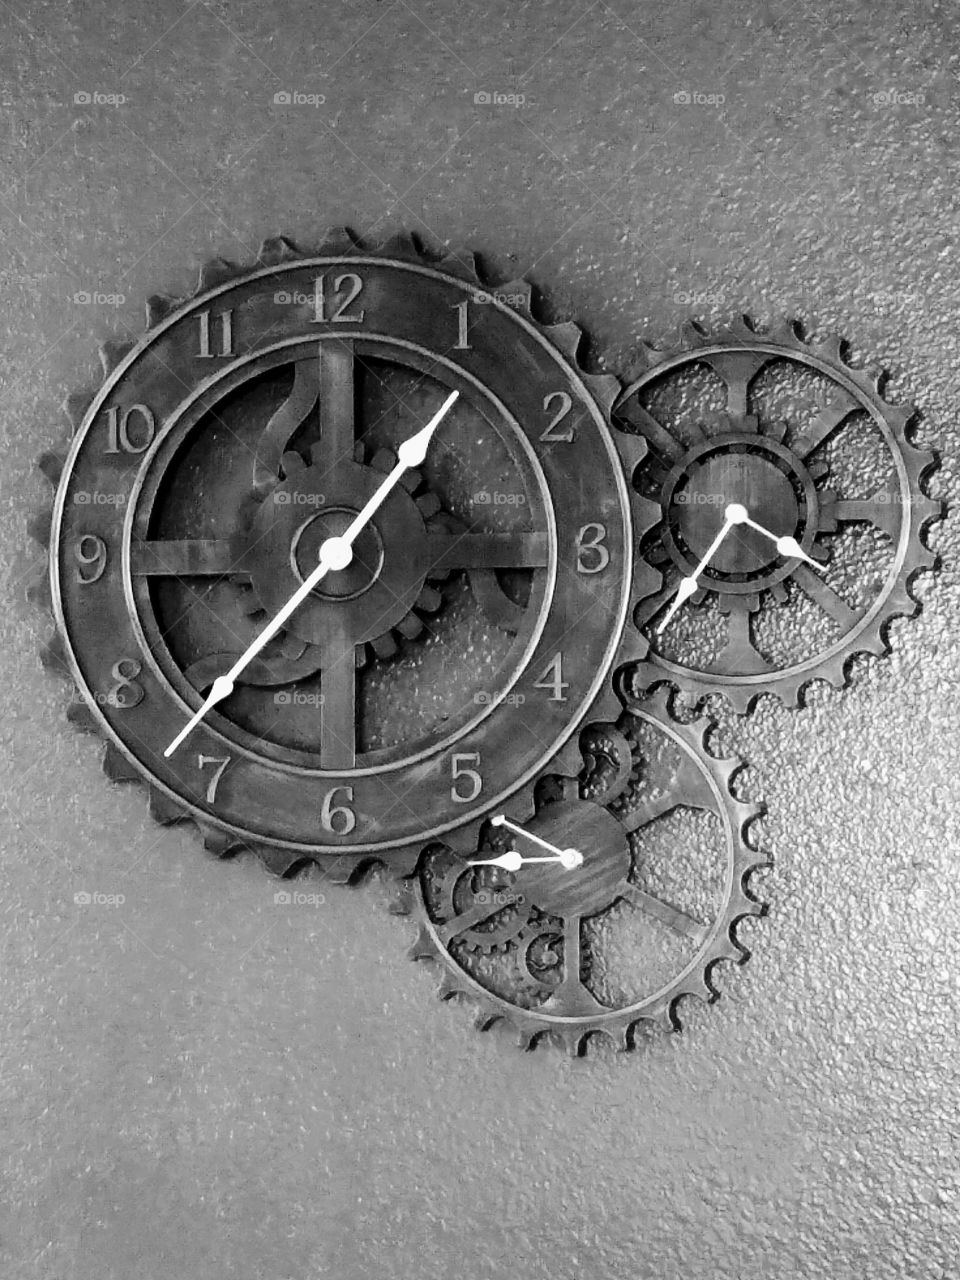 Triple clock